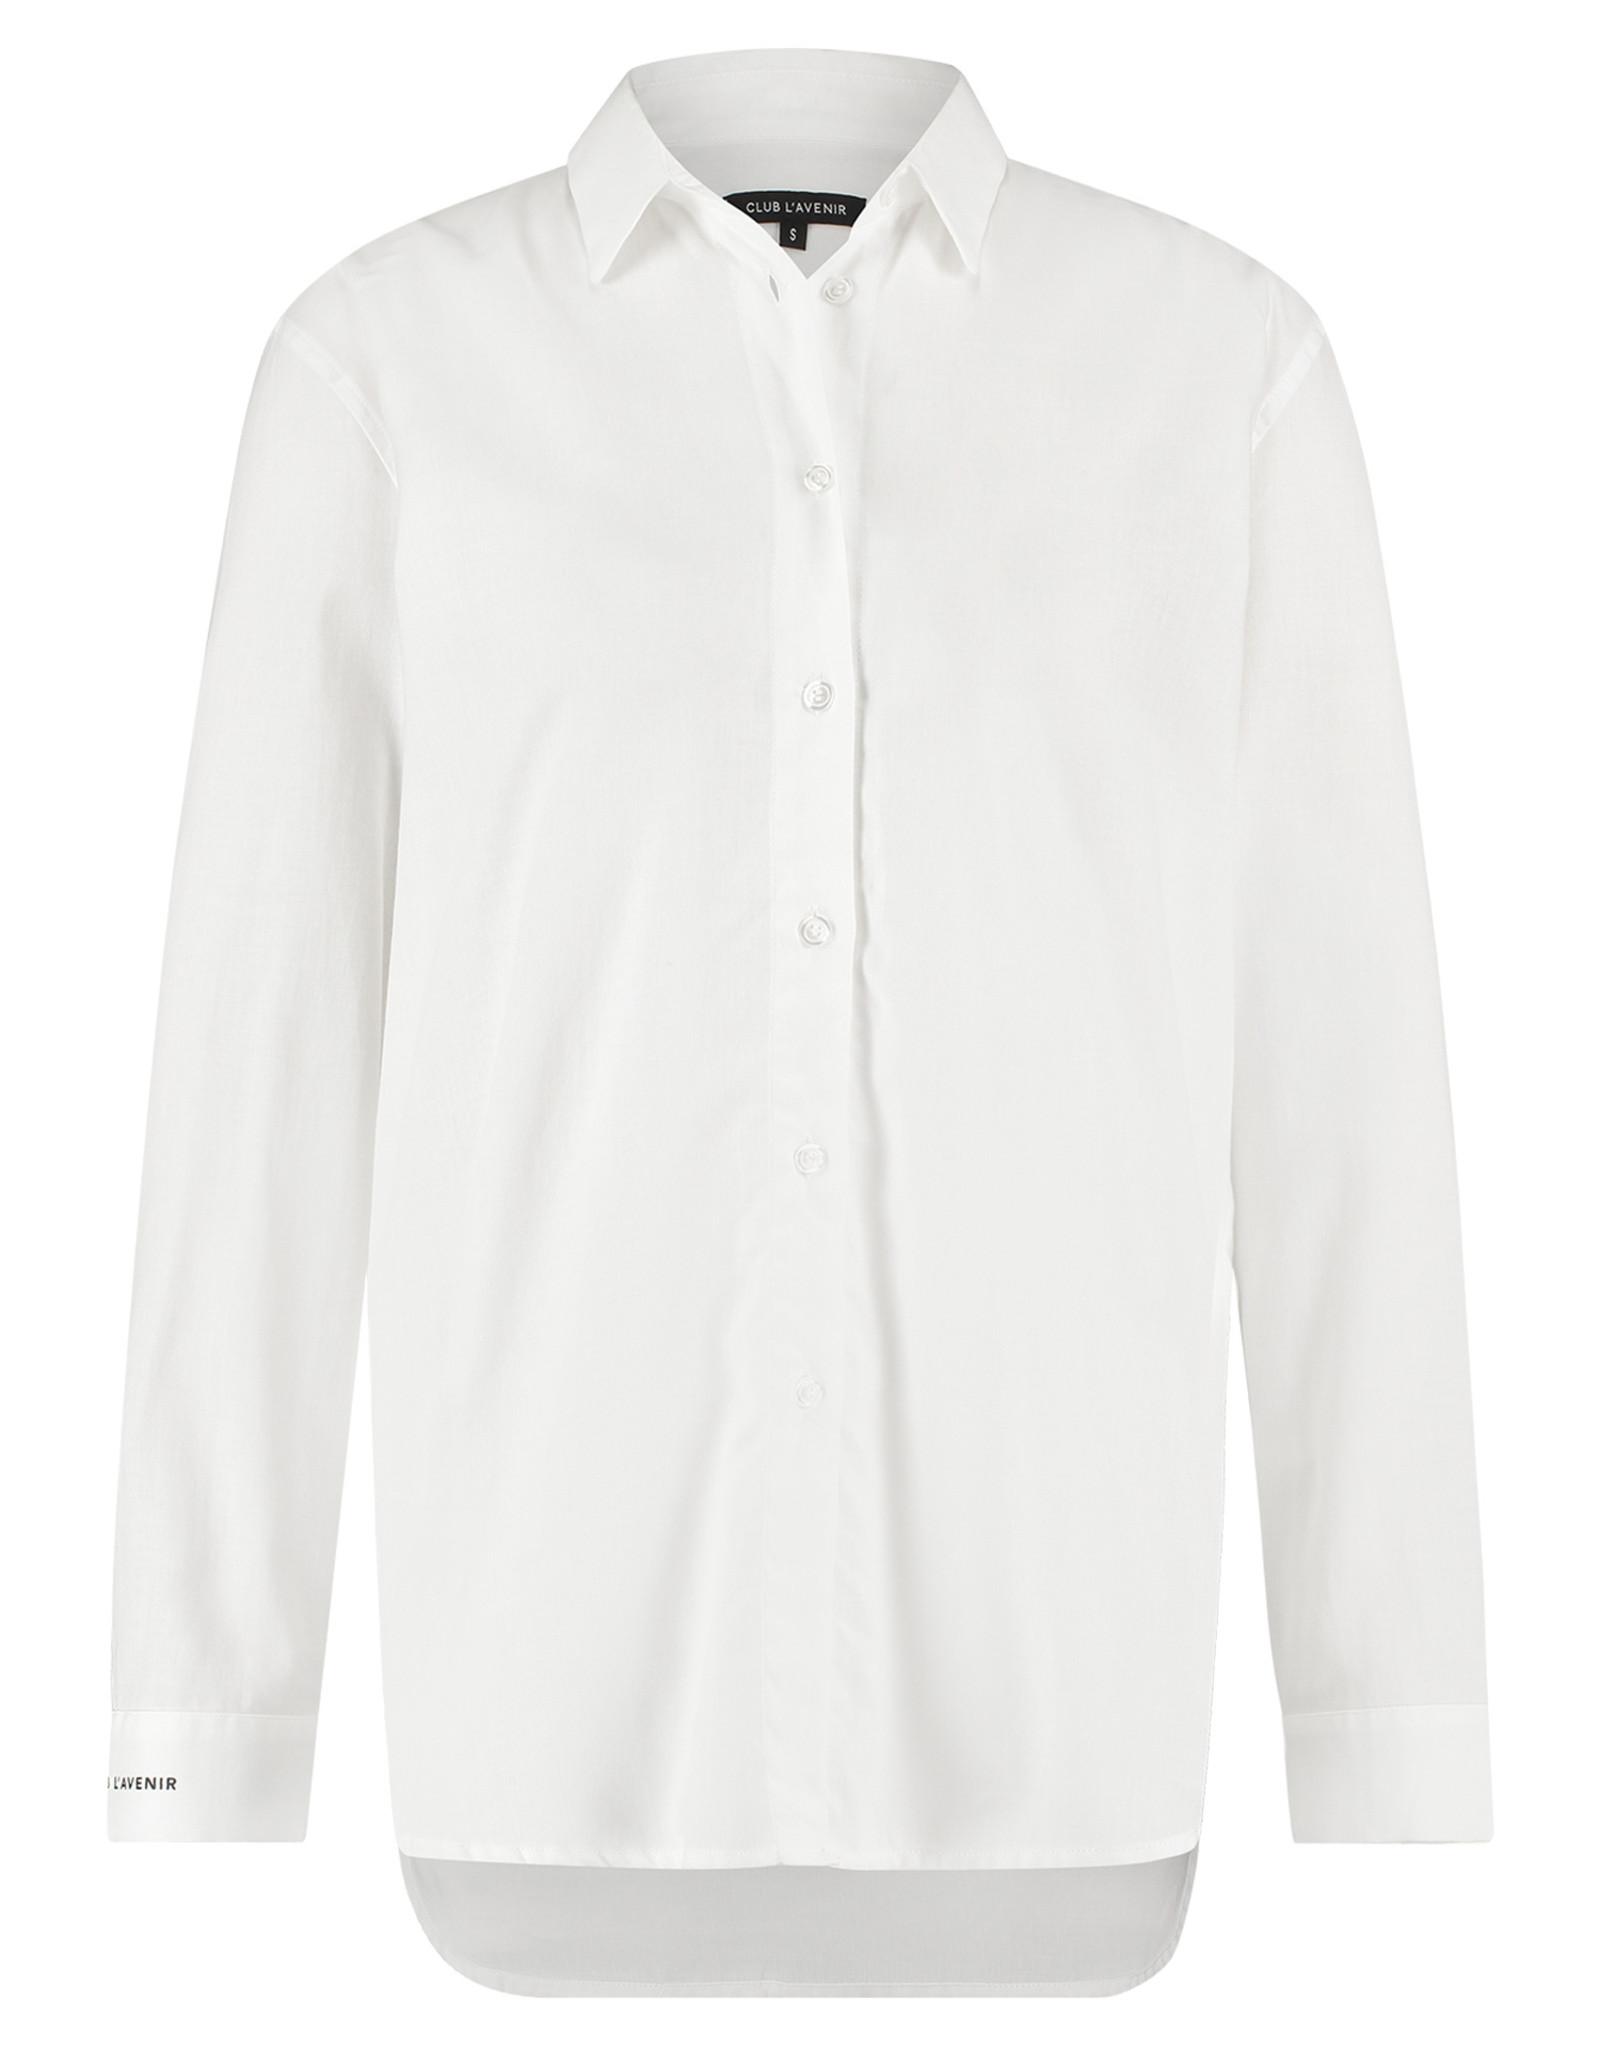 Club l'Avenir Boyish Rive Blouse White